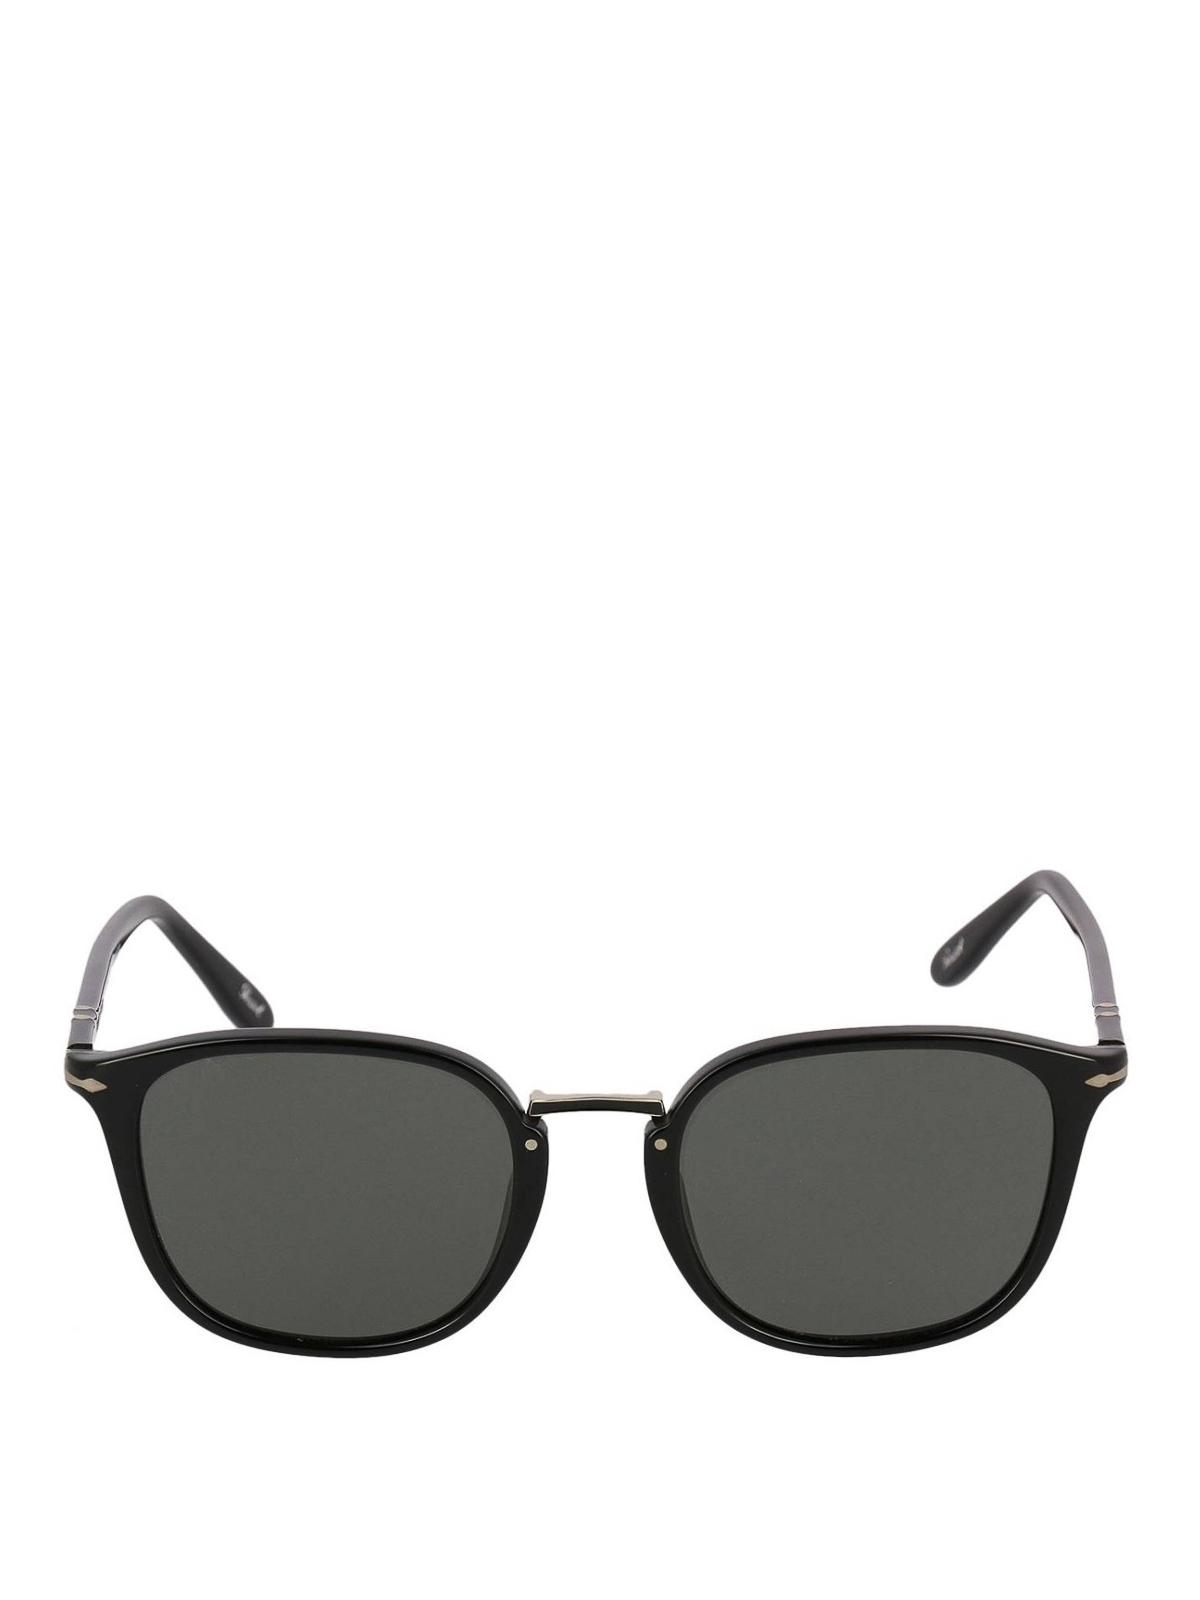 8a6a1b4d902 PERSOL  sunglasses online - Black panto sunglasses with metal bridge